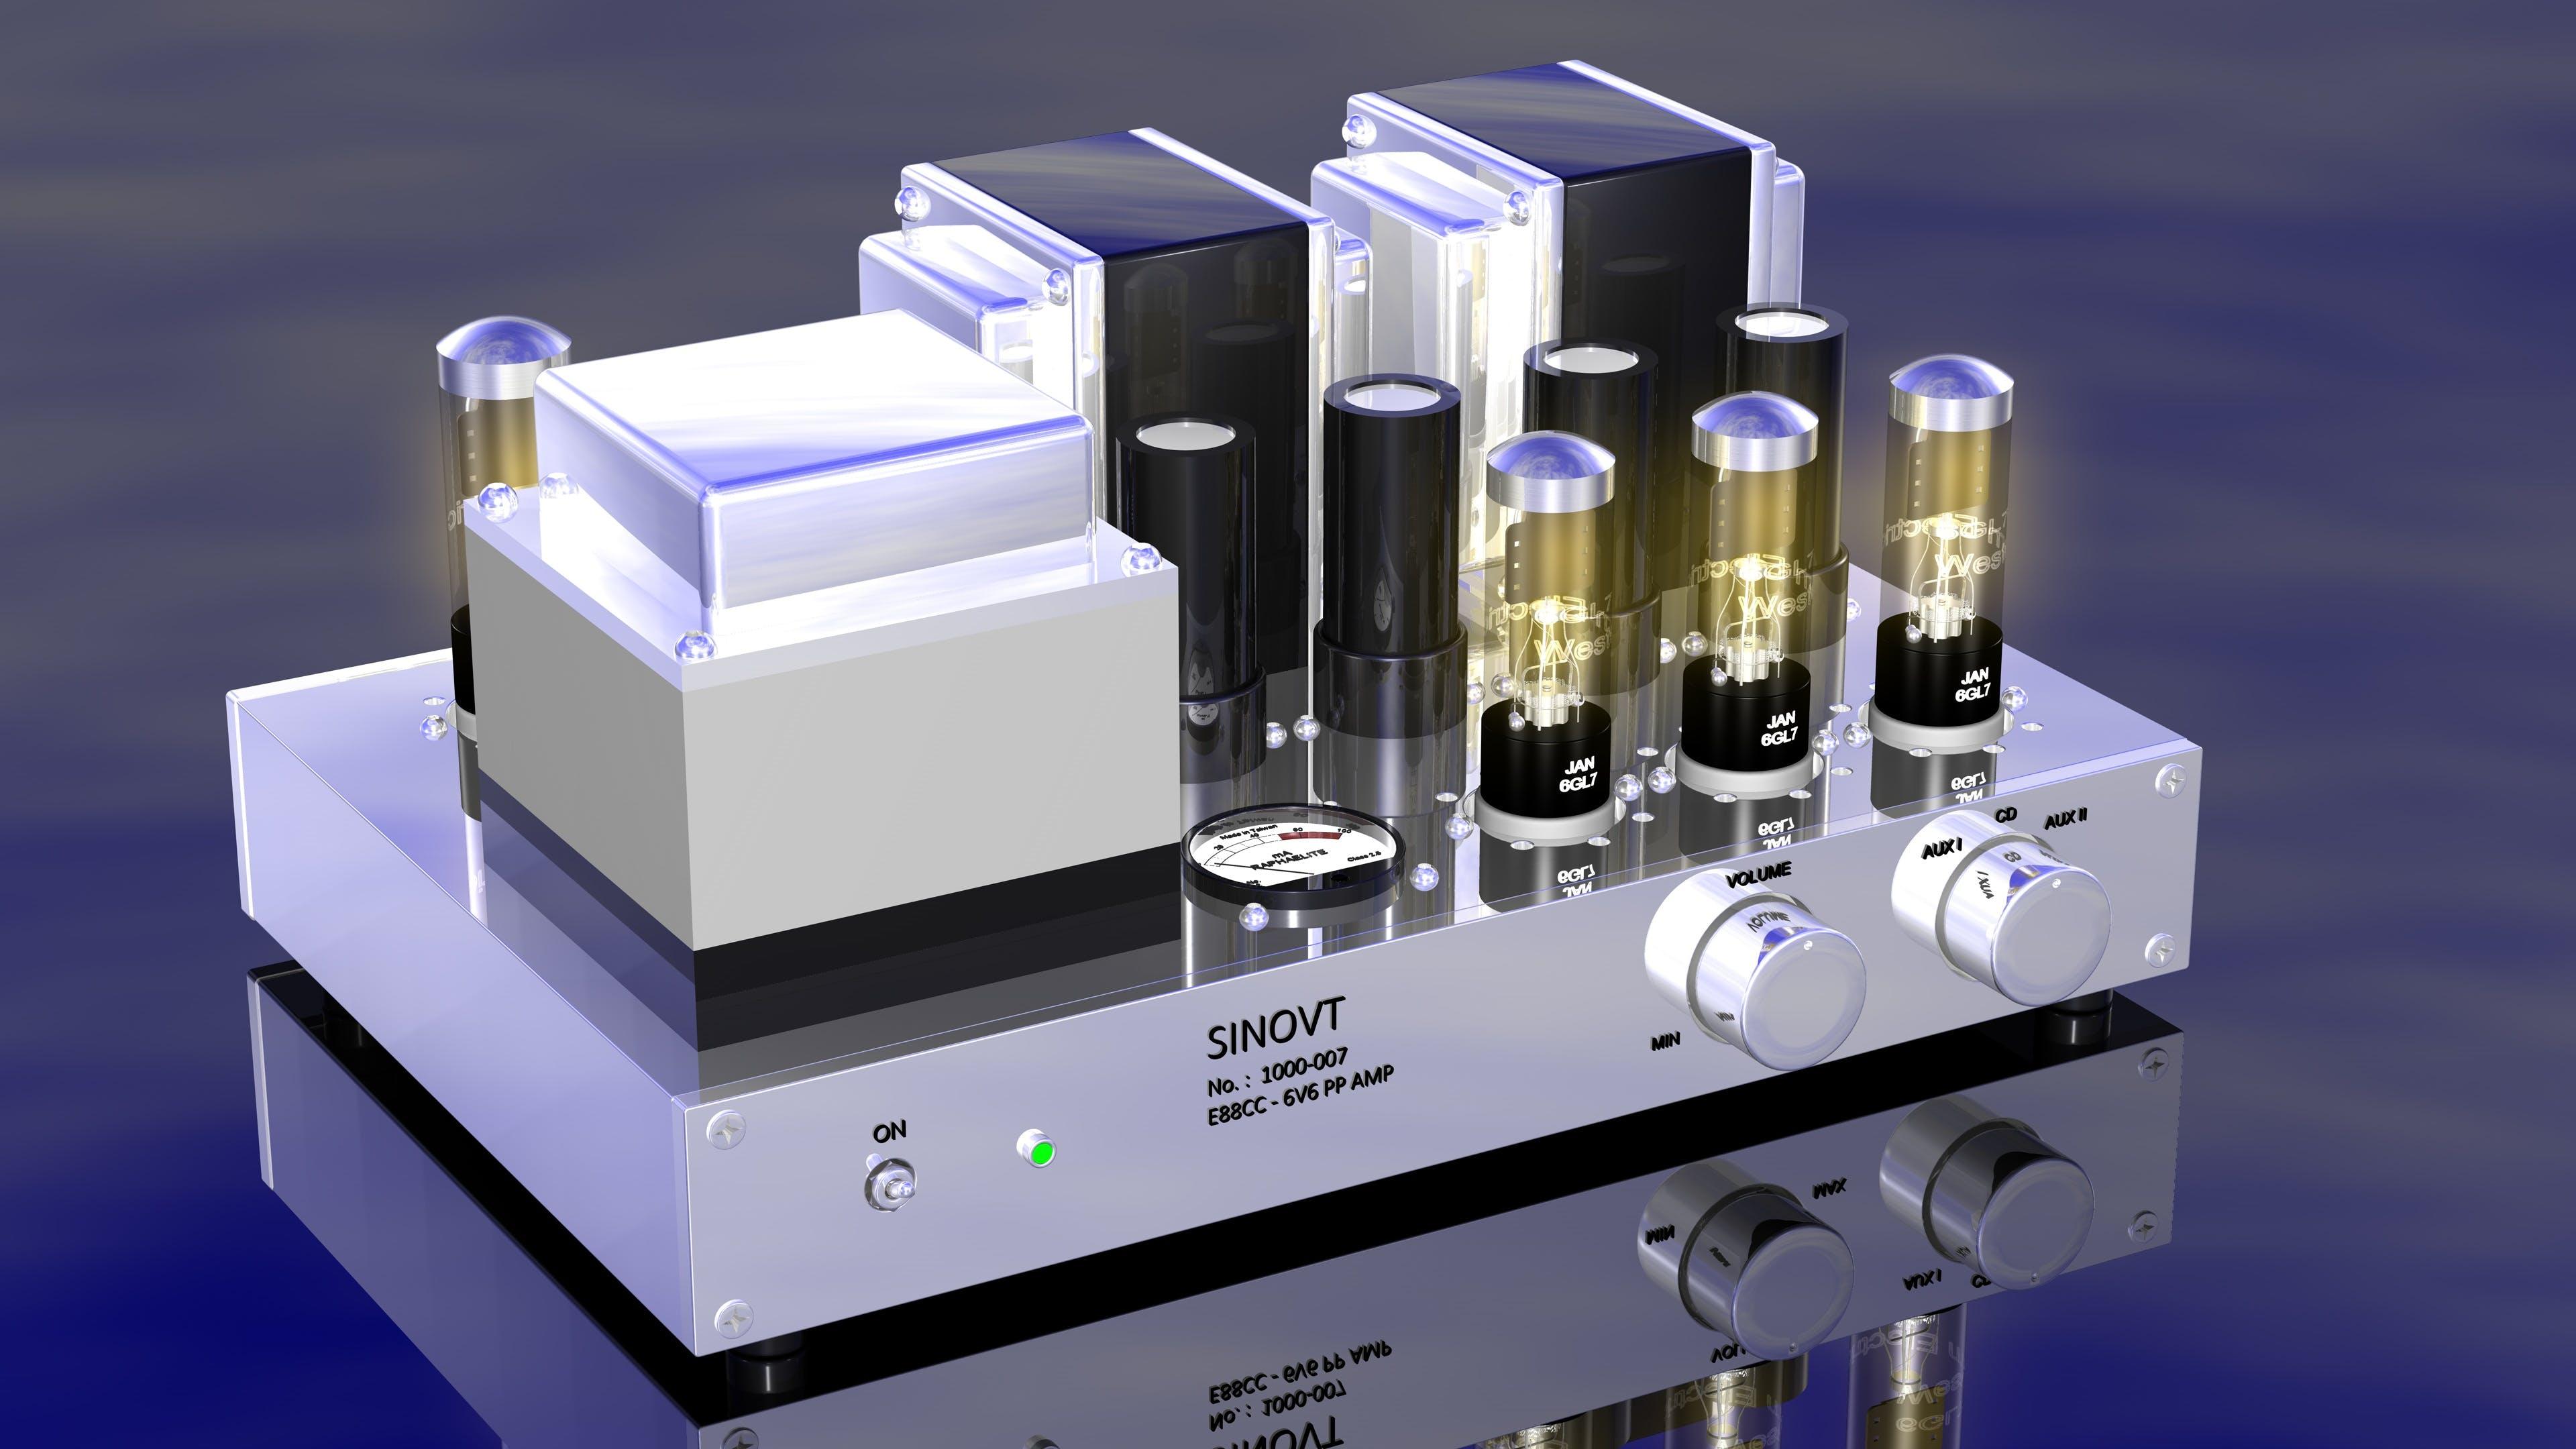 Free stock photo of extreme hifi technology, exotic hifi, tube full amplifier